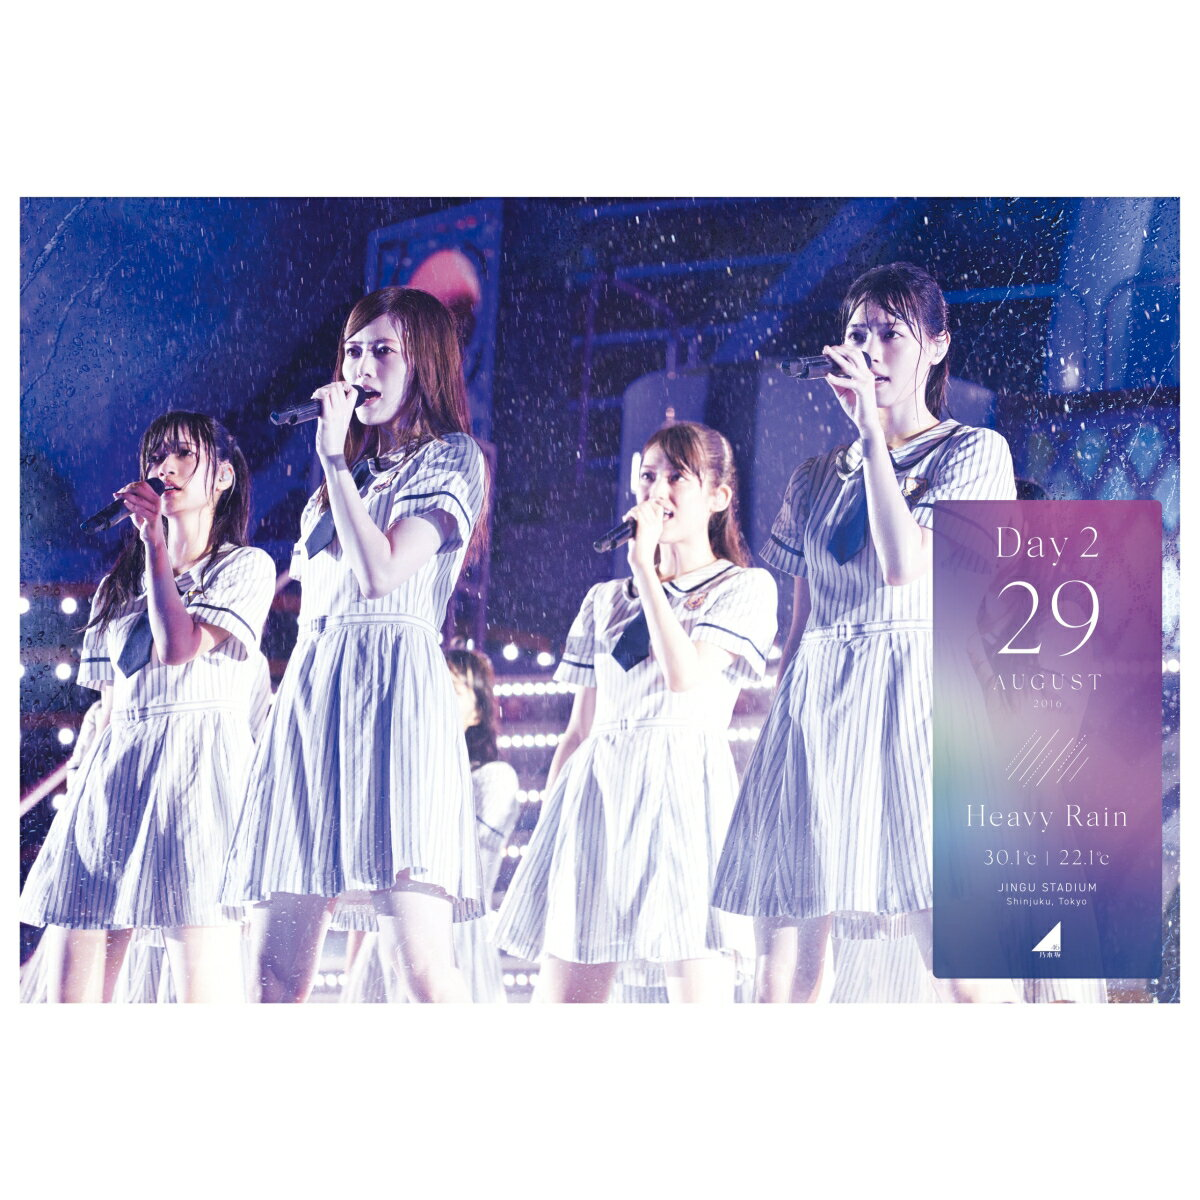 乃木坂46 4th YEAR BIRTHDAY LIVE 2016.8.28-30 JINGU STADIUM Day2【Blu-ray】 [ 乃木坂46 ]